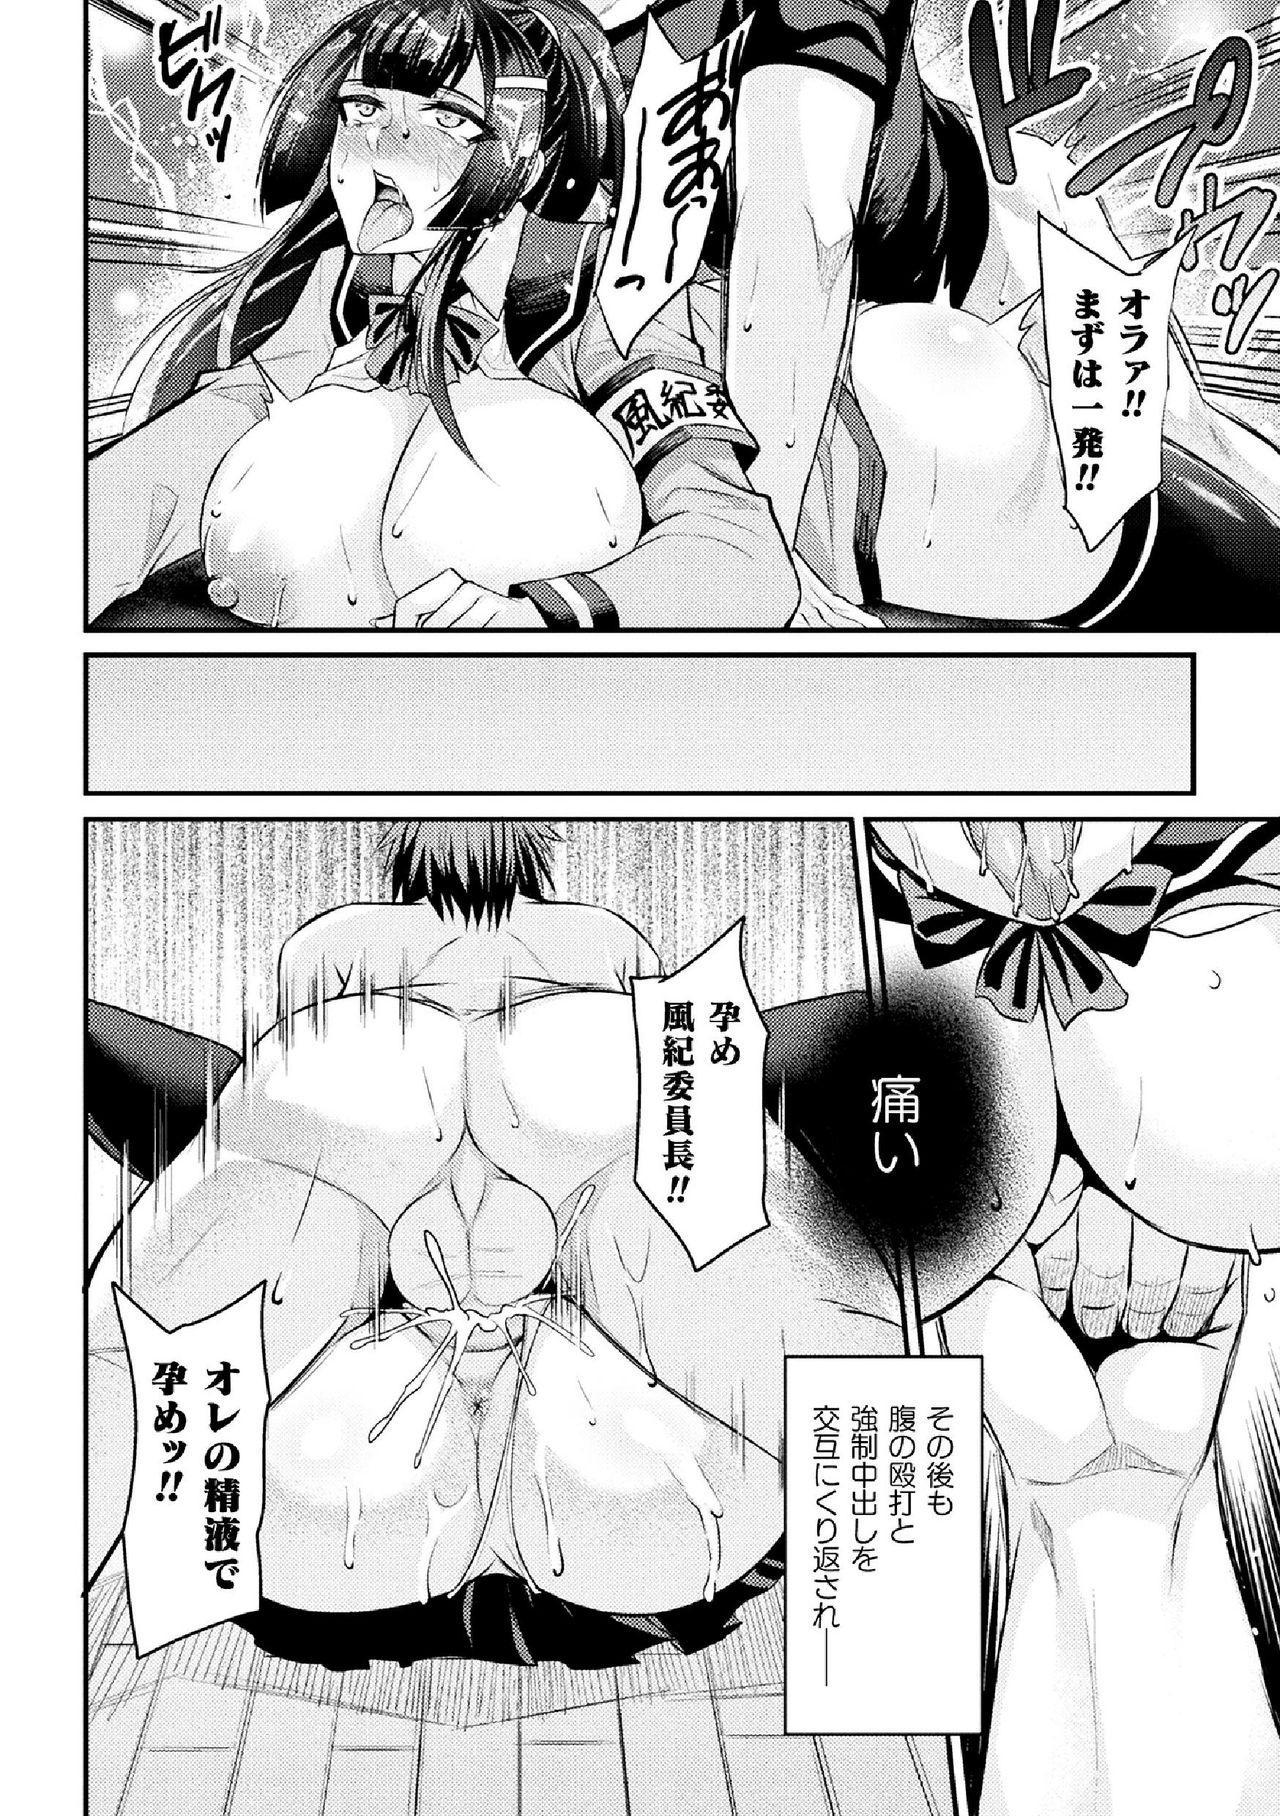 2D Comic Magazine Namaiki Onna ni HaraPun Seisai! Vol. 2 17